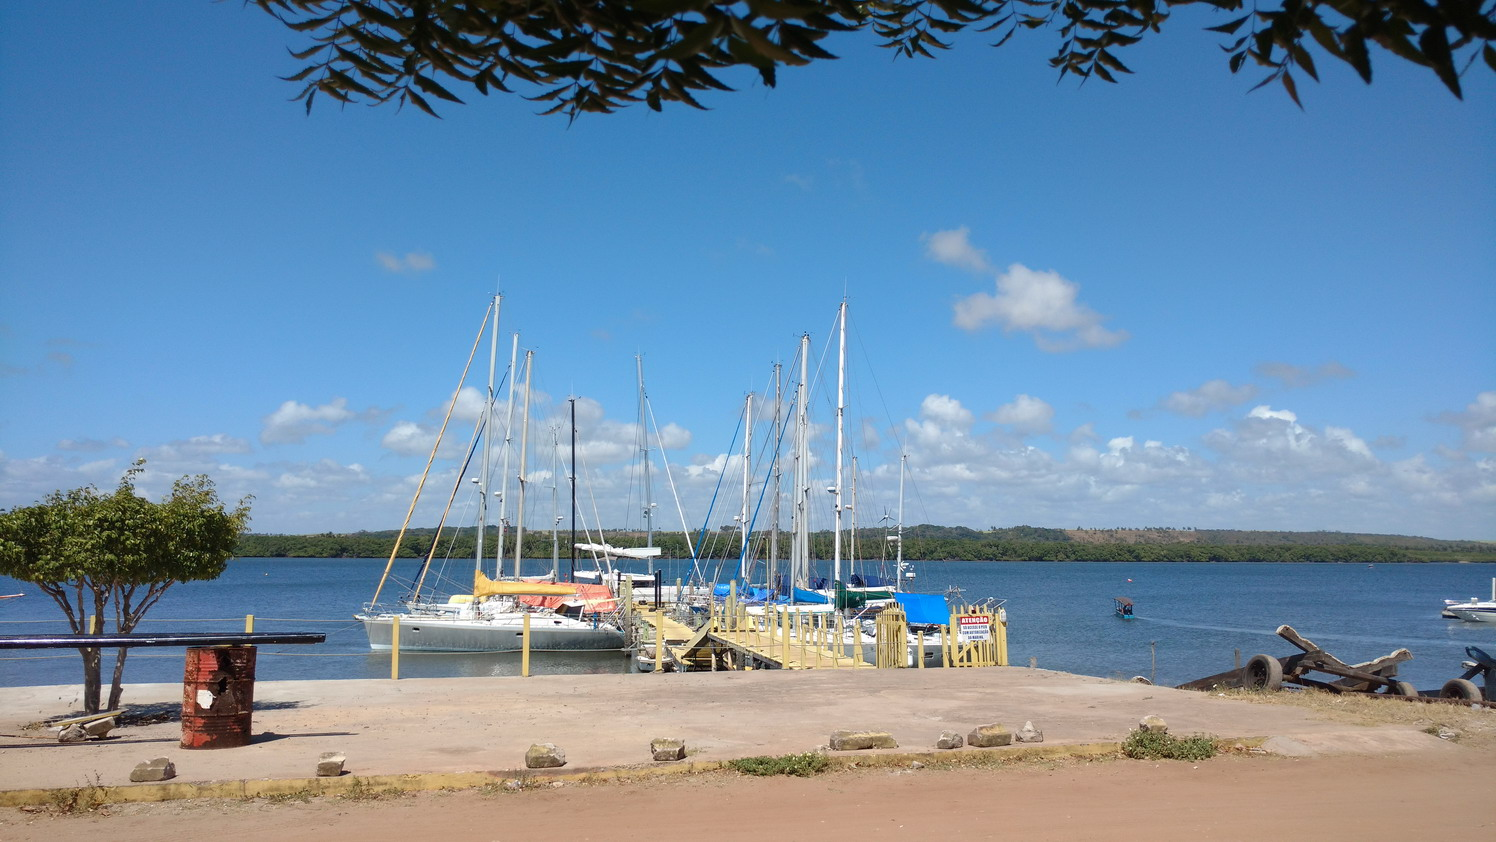 Derniers moments à la marina de Jacaré